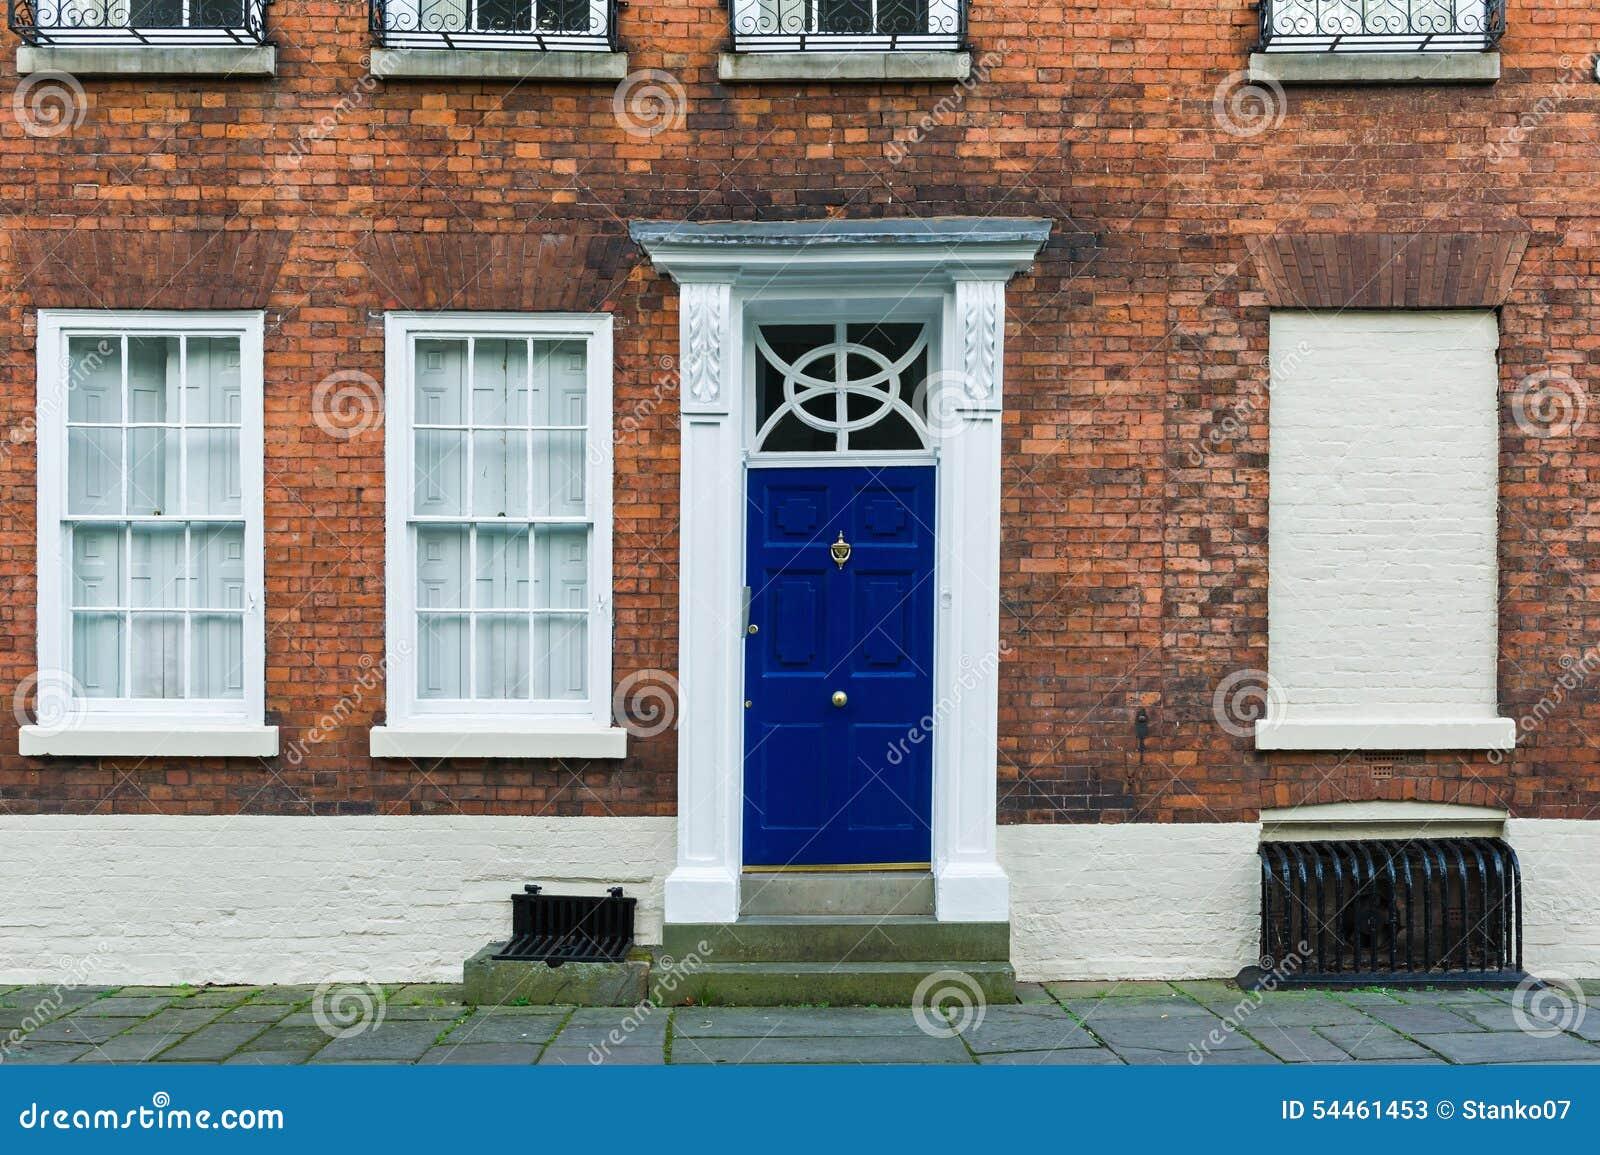 British House Entrance Door Stock Photo - Image: 54461453